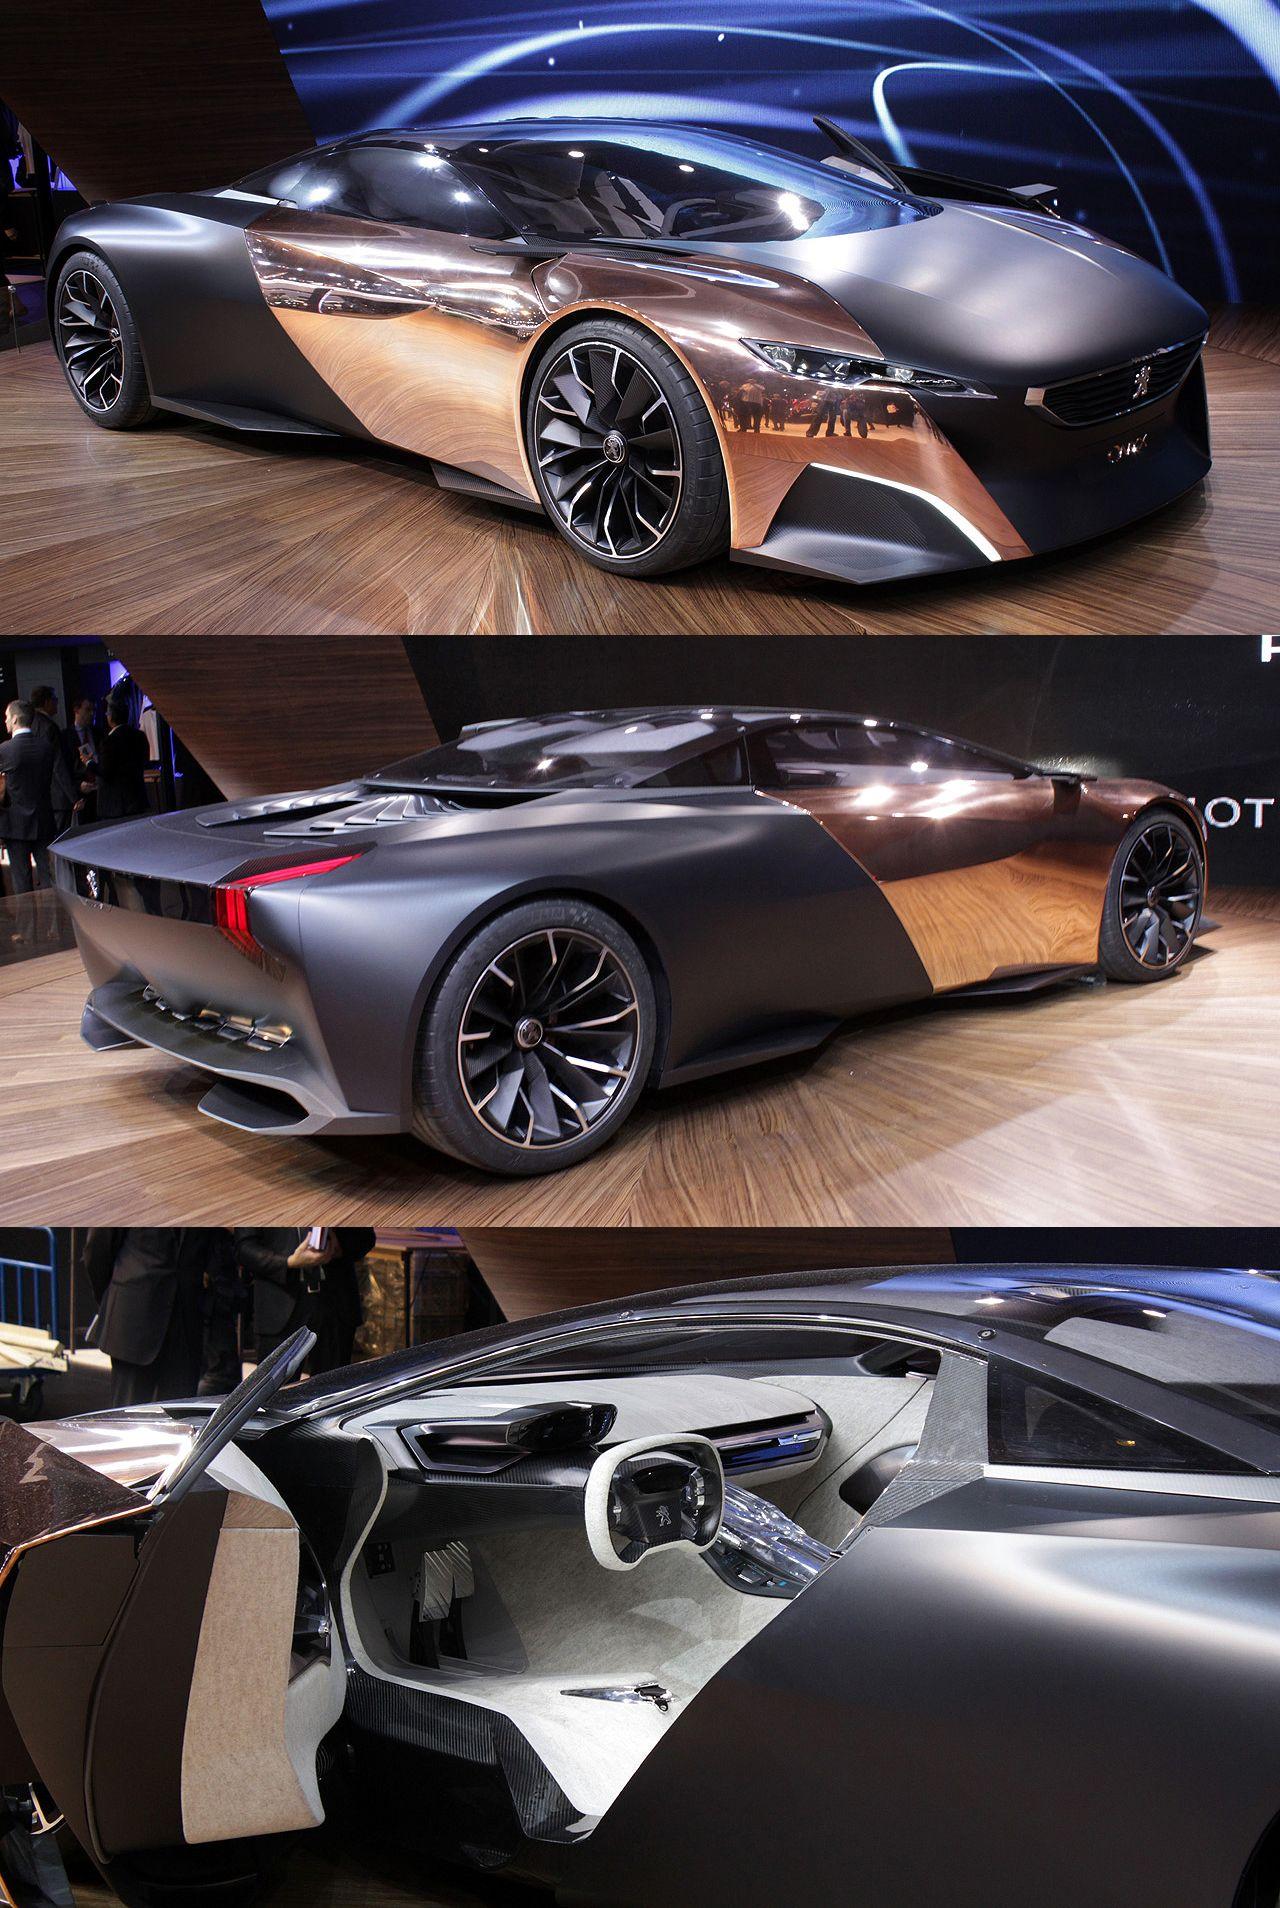 2012 peugeot diesel hybrid onyx concept car lm pinterest concept cars cars and peugeot. Black Bedroom Furniture Sets. Home Design Ideas